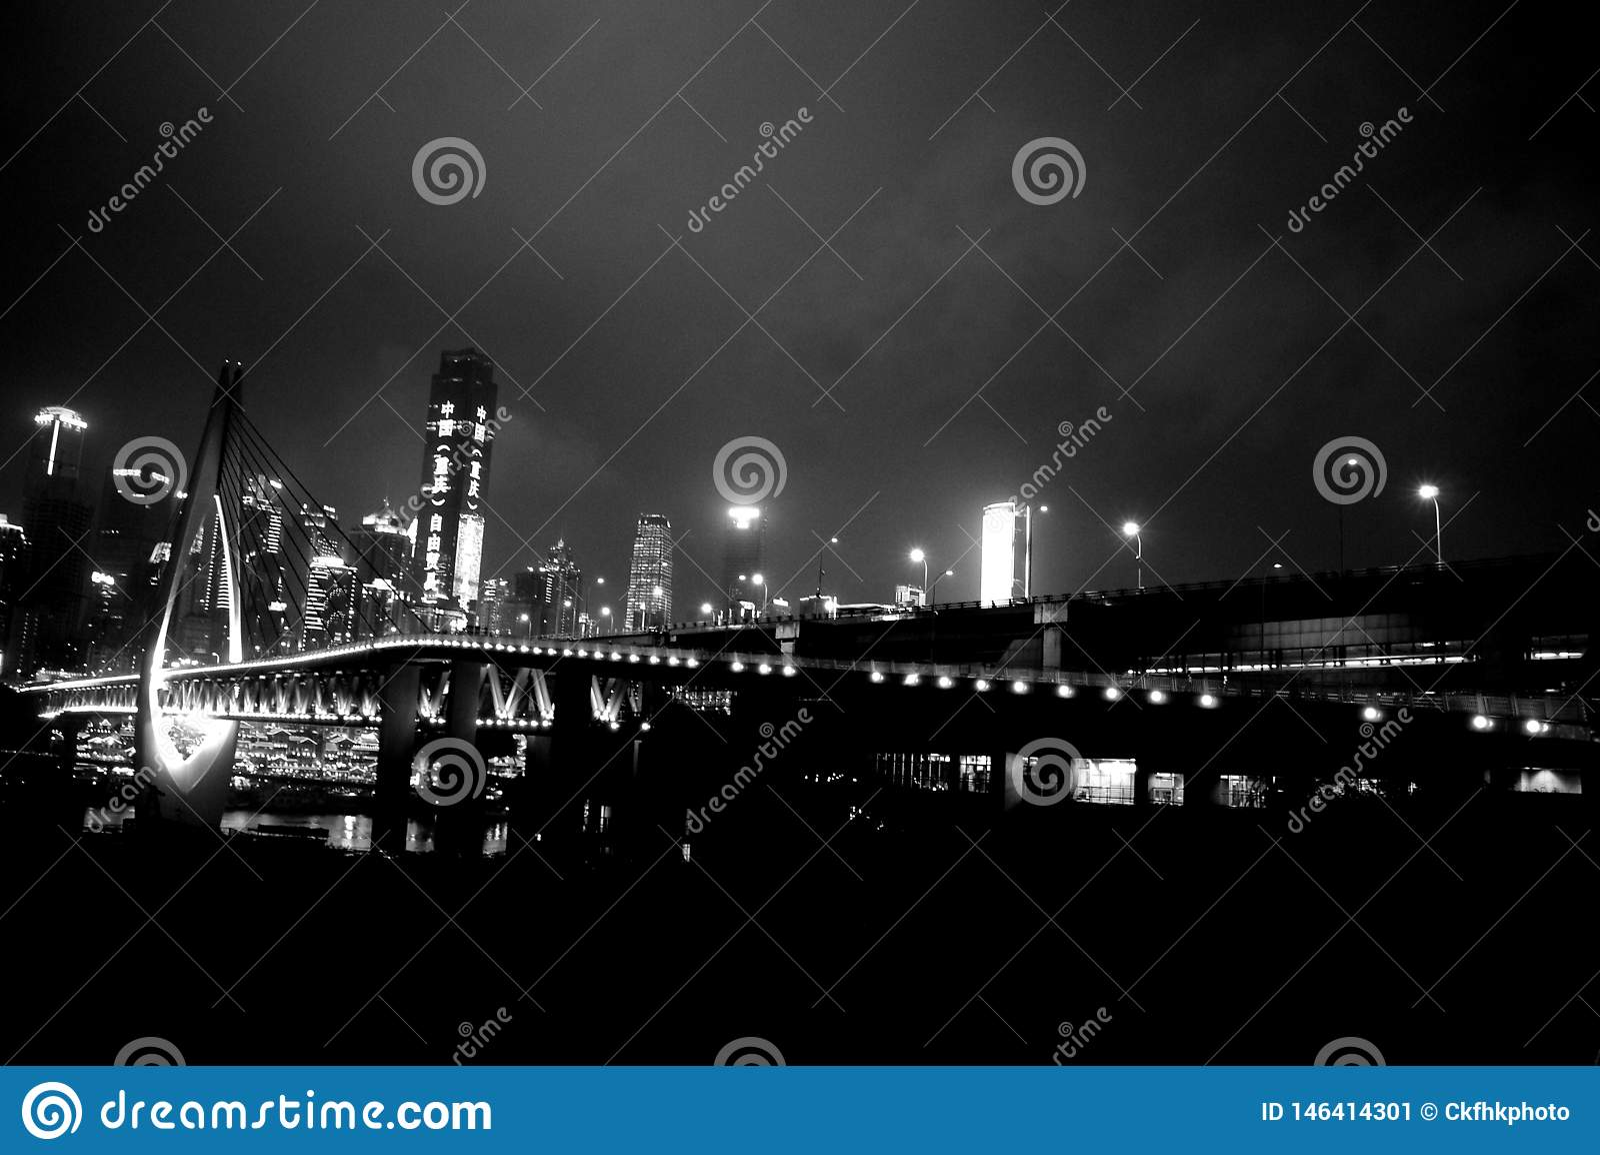 Chongqing Millennium Bridge